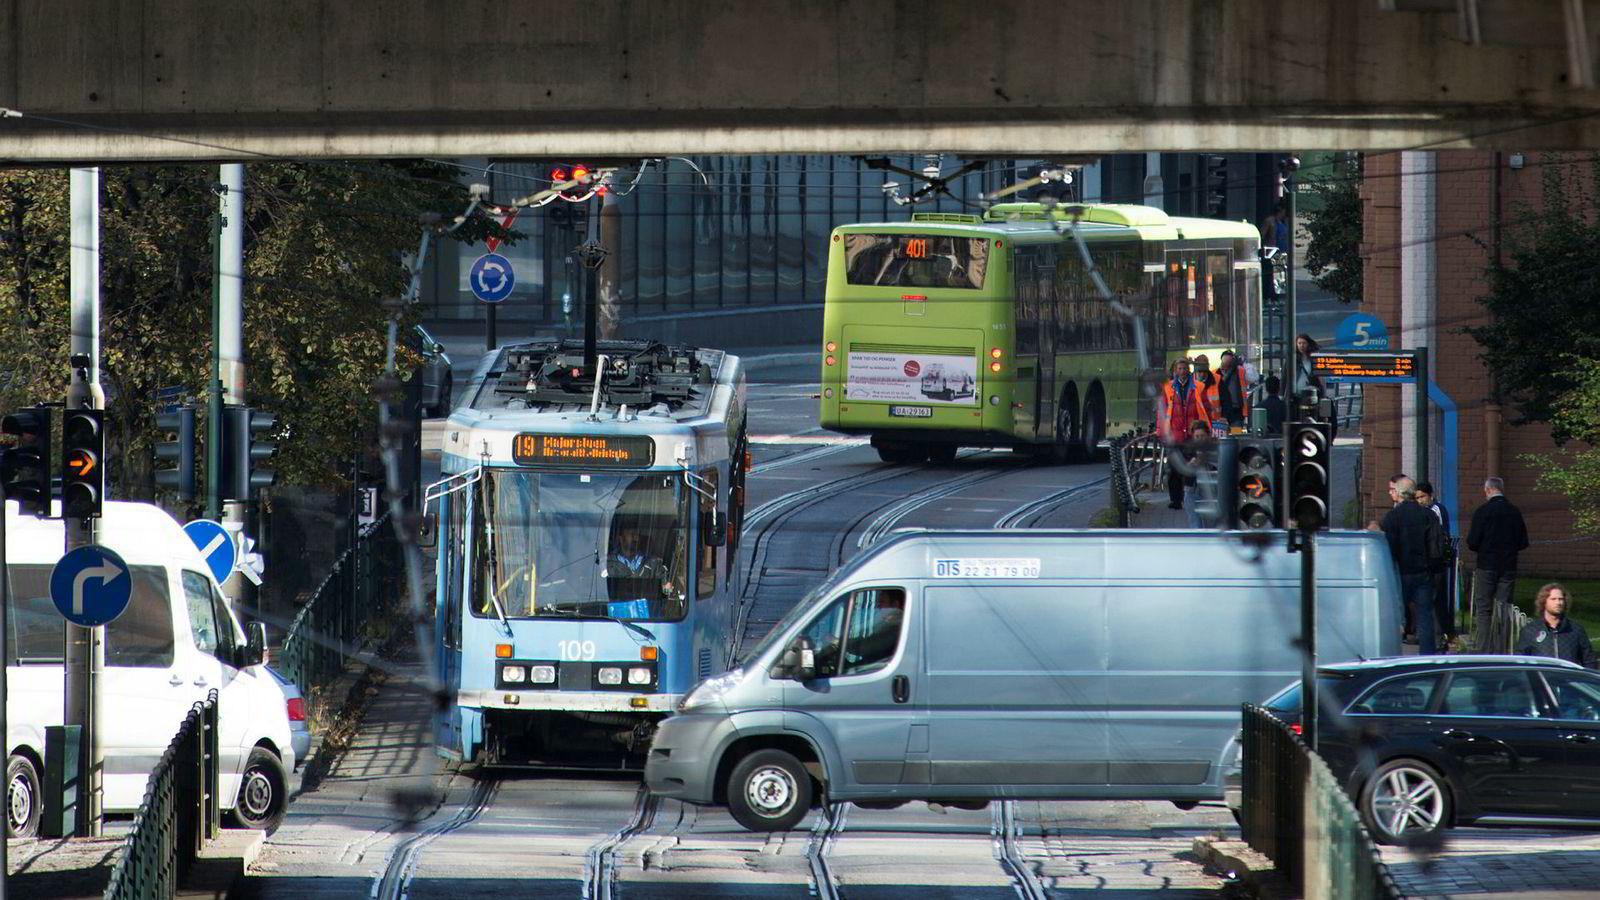 Oslo30.09.2015 Trafikk Oslo sentrum. Trikk Buss Bil Kollektivtransport transport Foto: Per Ståle Bugjerde